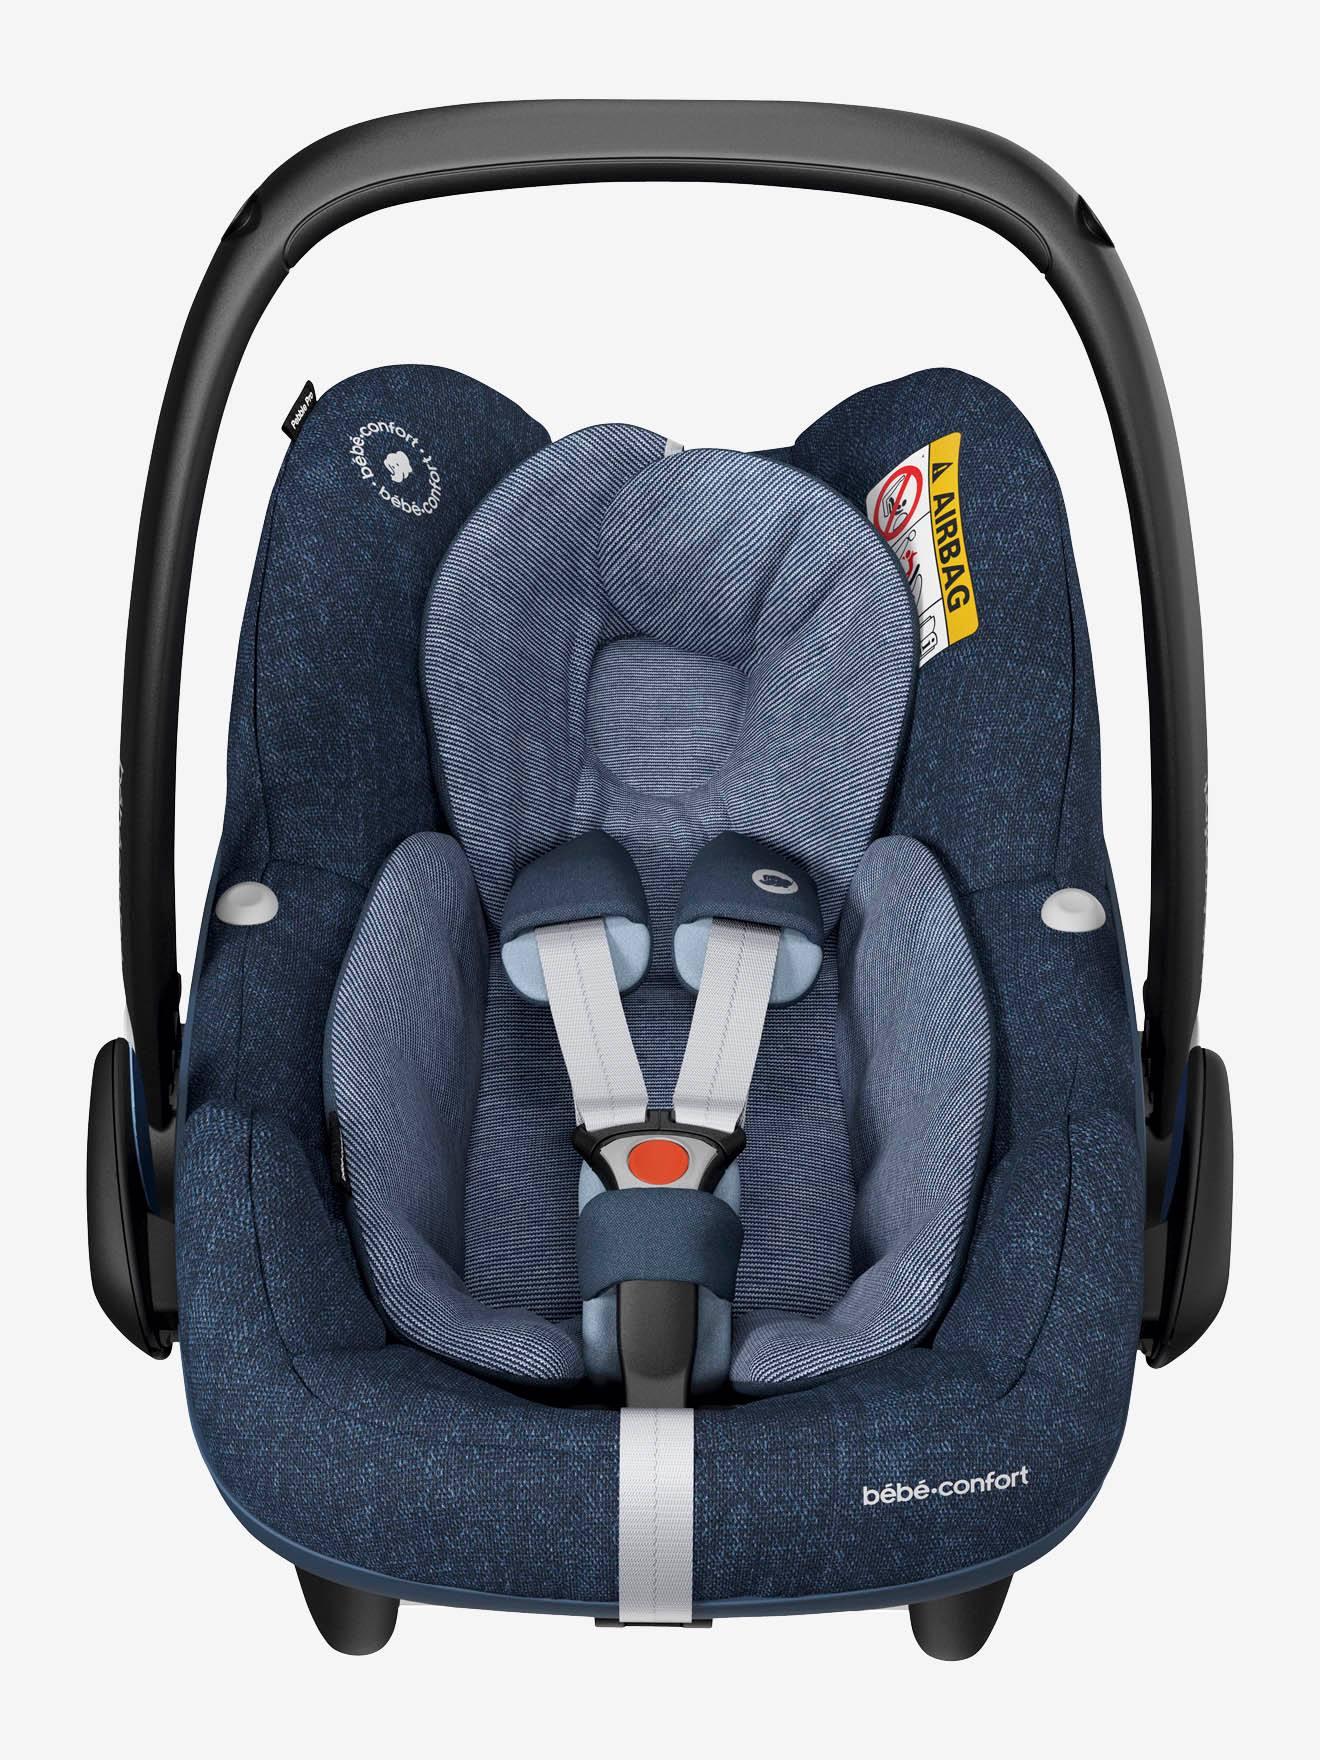 Cadeira-auto Cosi Pebble Pro i-Size, BEBE CONFORT azul medio mesclado